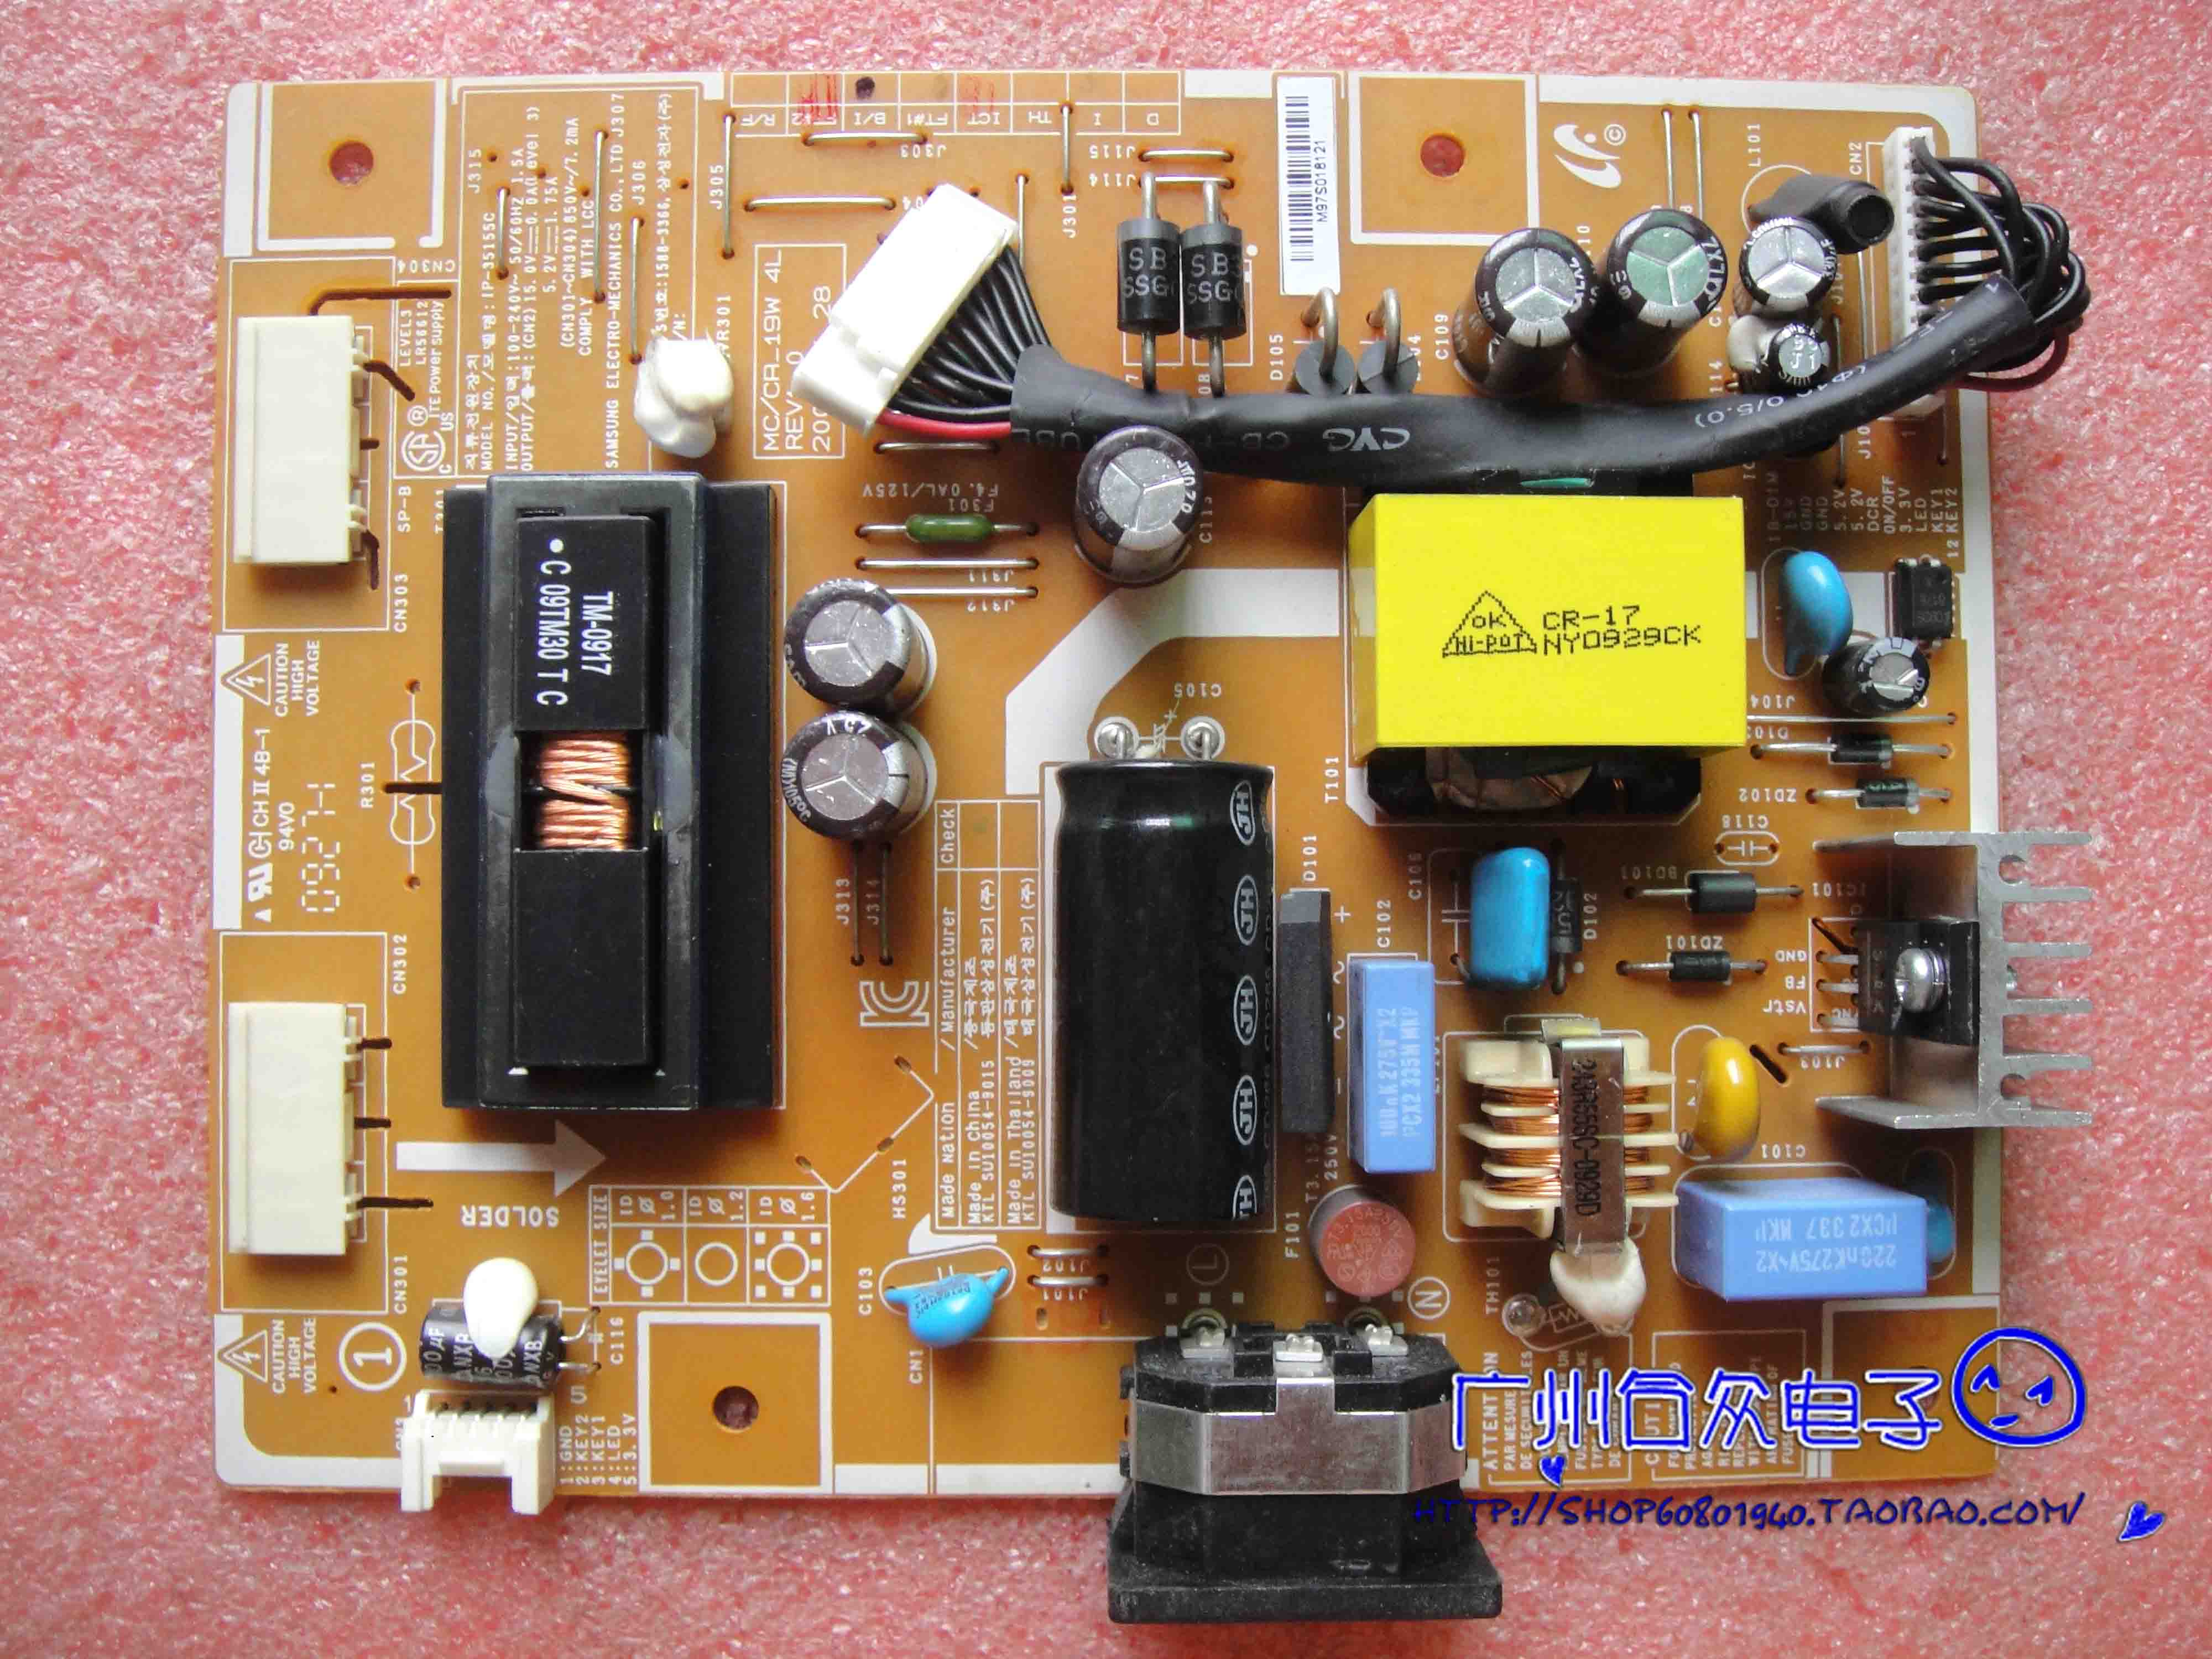 IP-35155C MC/4L CR_19W REV1.0 TM-0917 CR-17